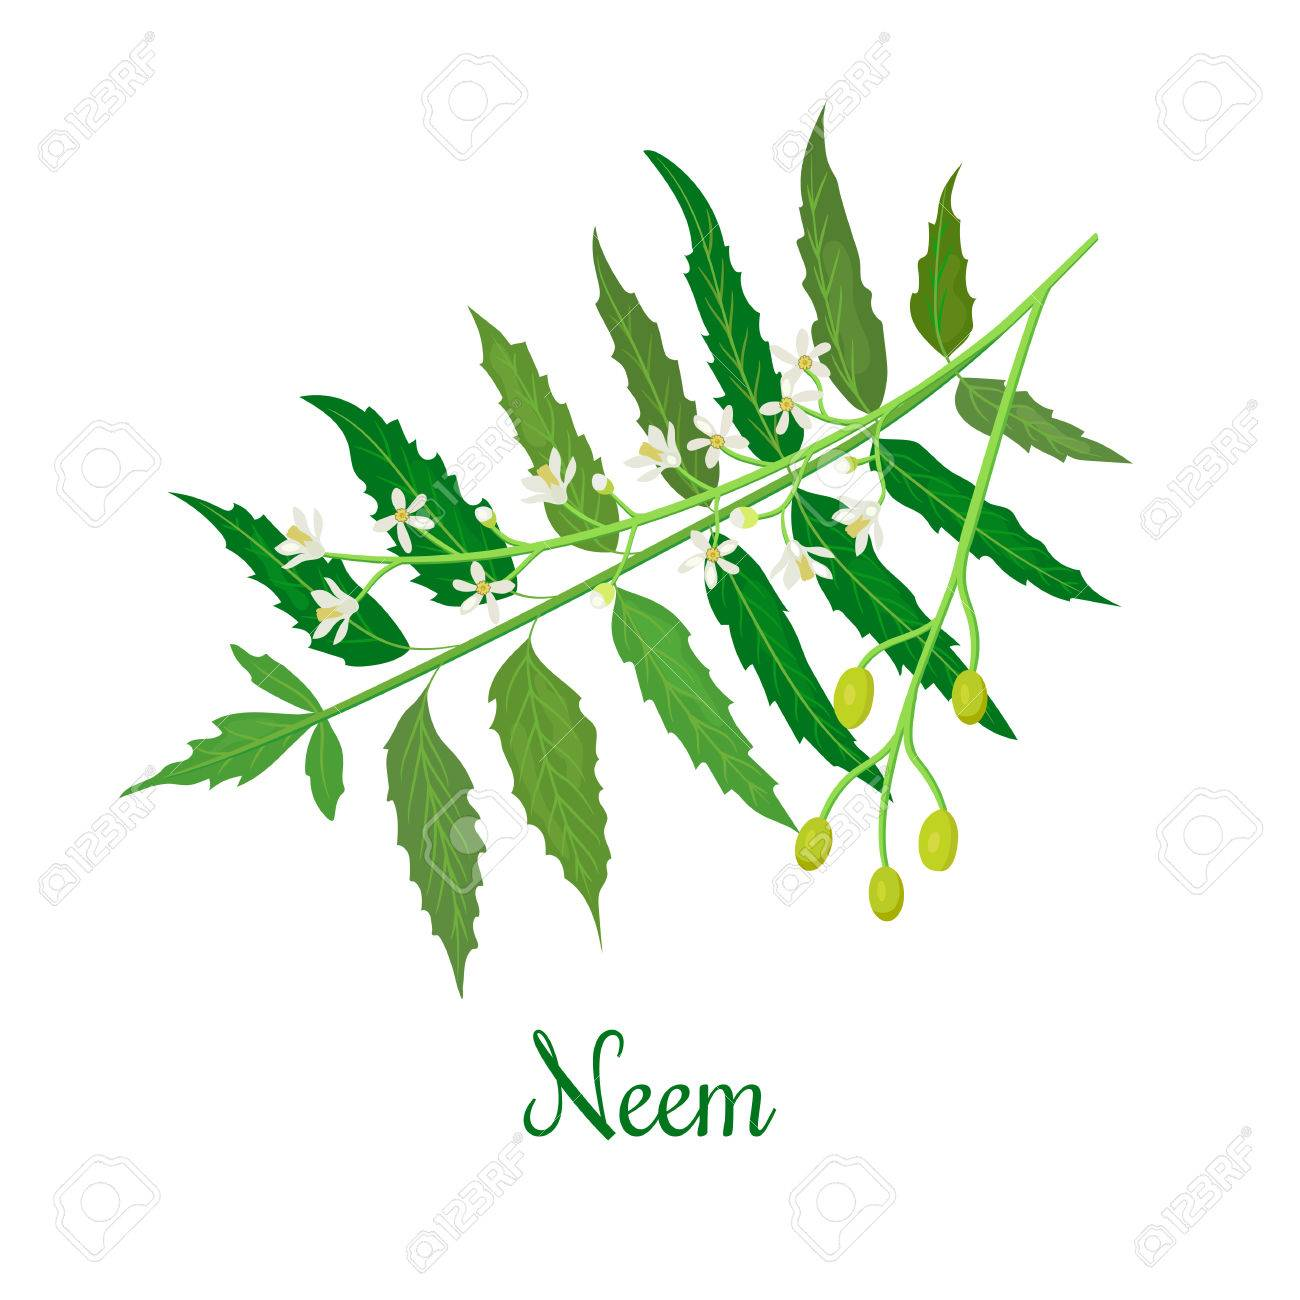 Neem Or Nimtree Medicinal Plant Twig Flowers And Berries Royalty